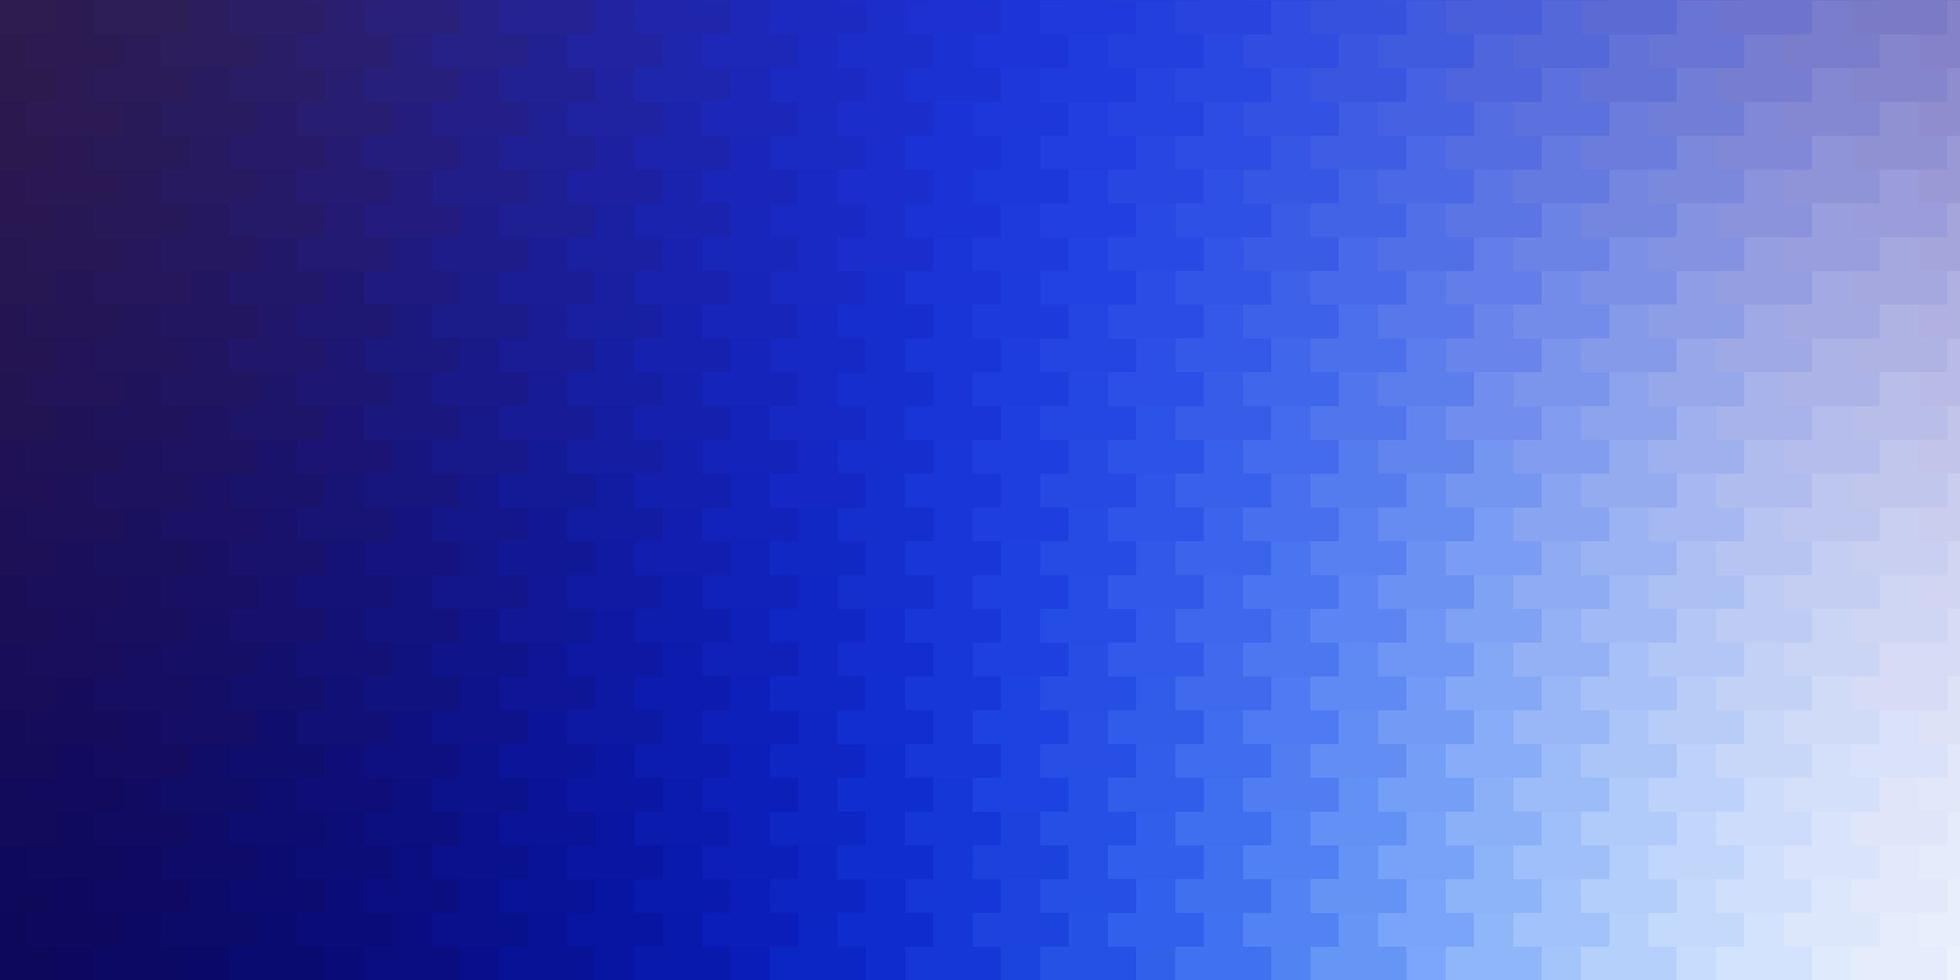 Telón de fondo de vector rosa claro, azul con rectángulos.